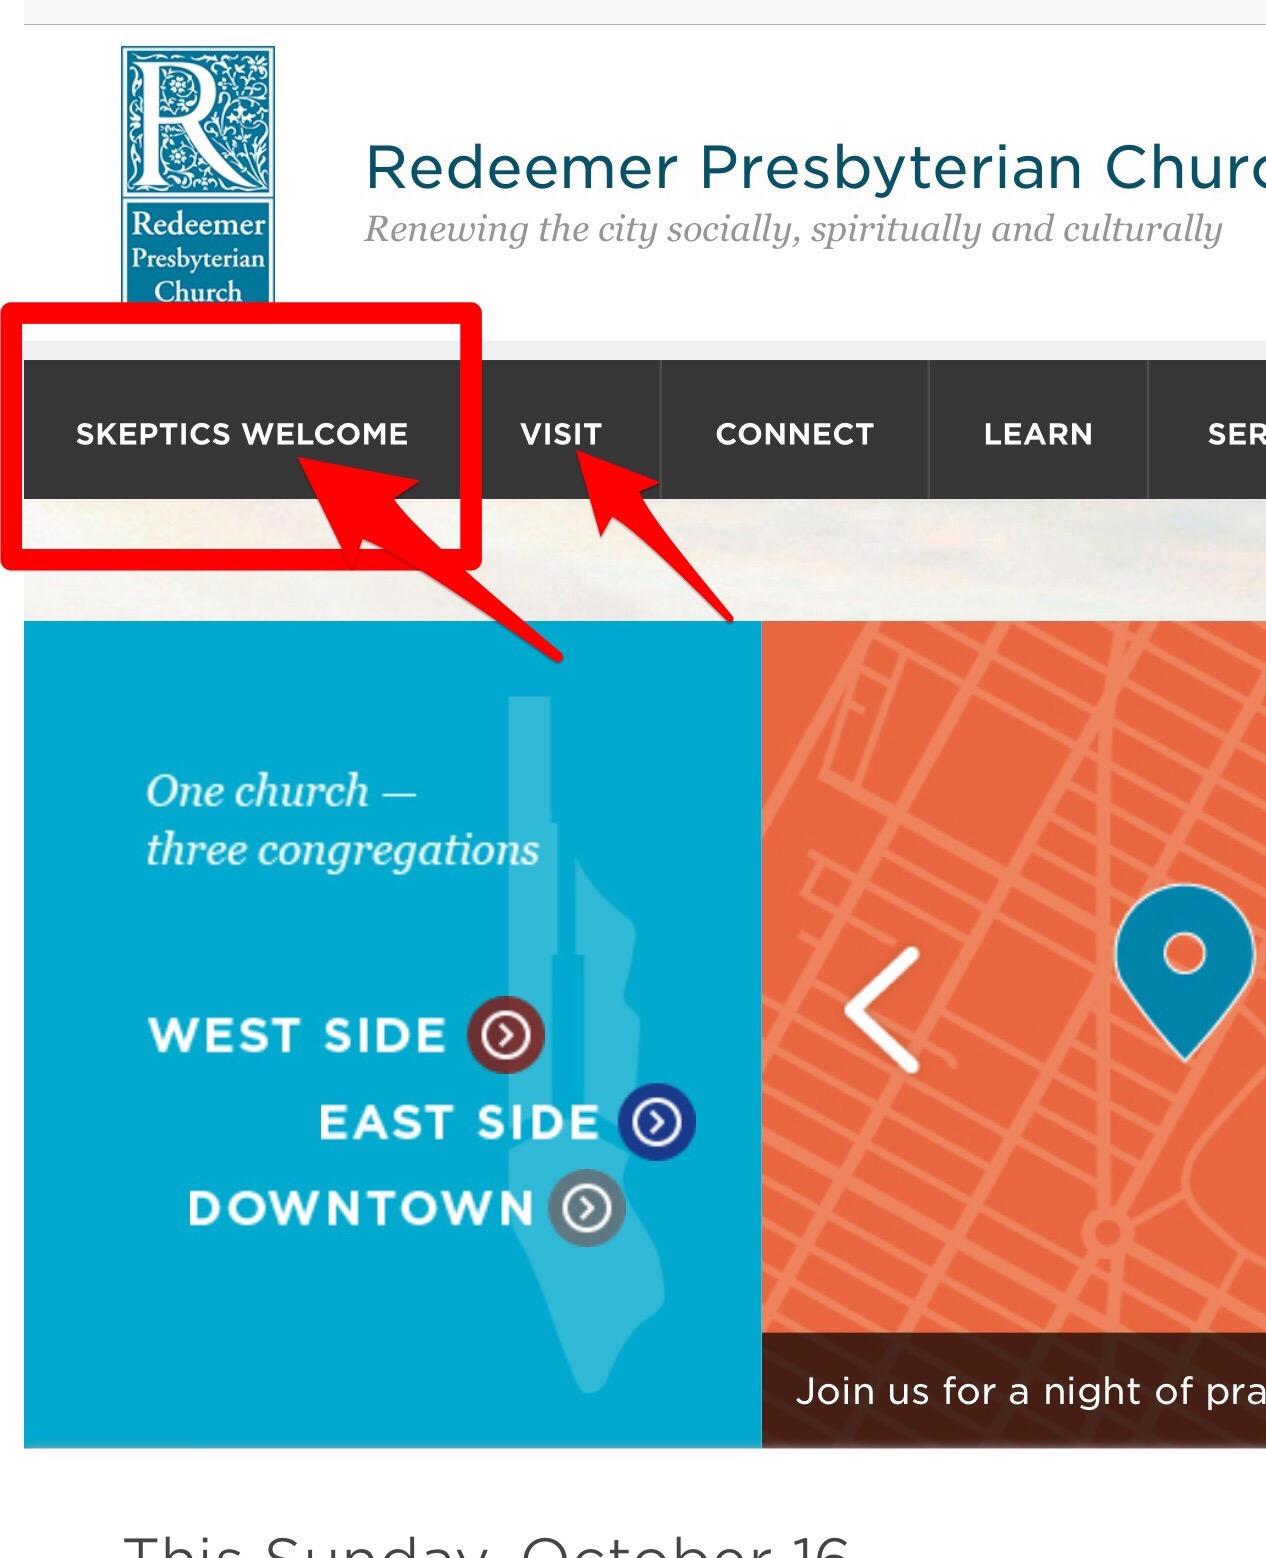 Redeemer website strategy in navigation menu